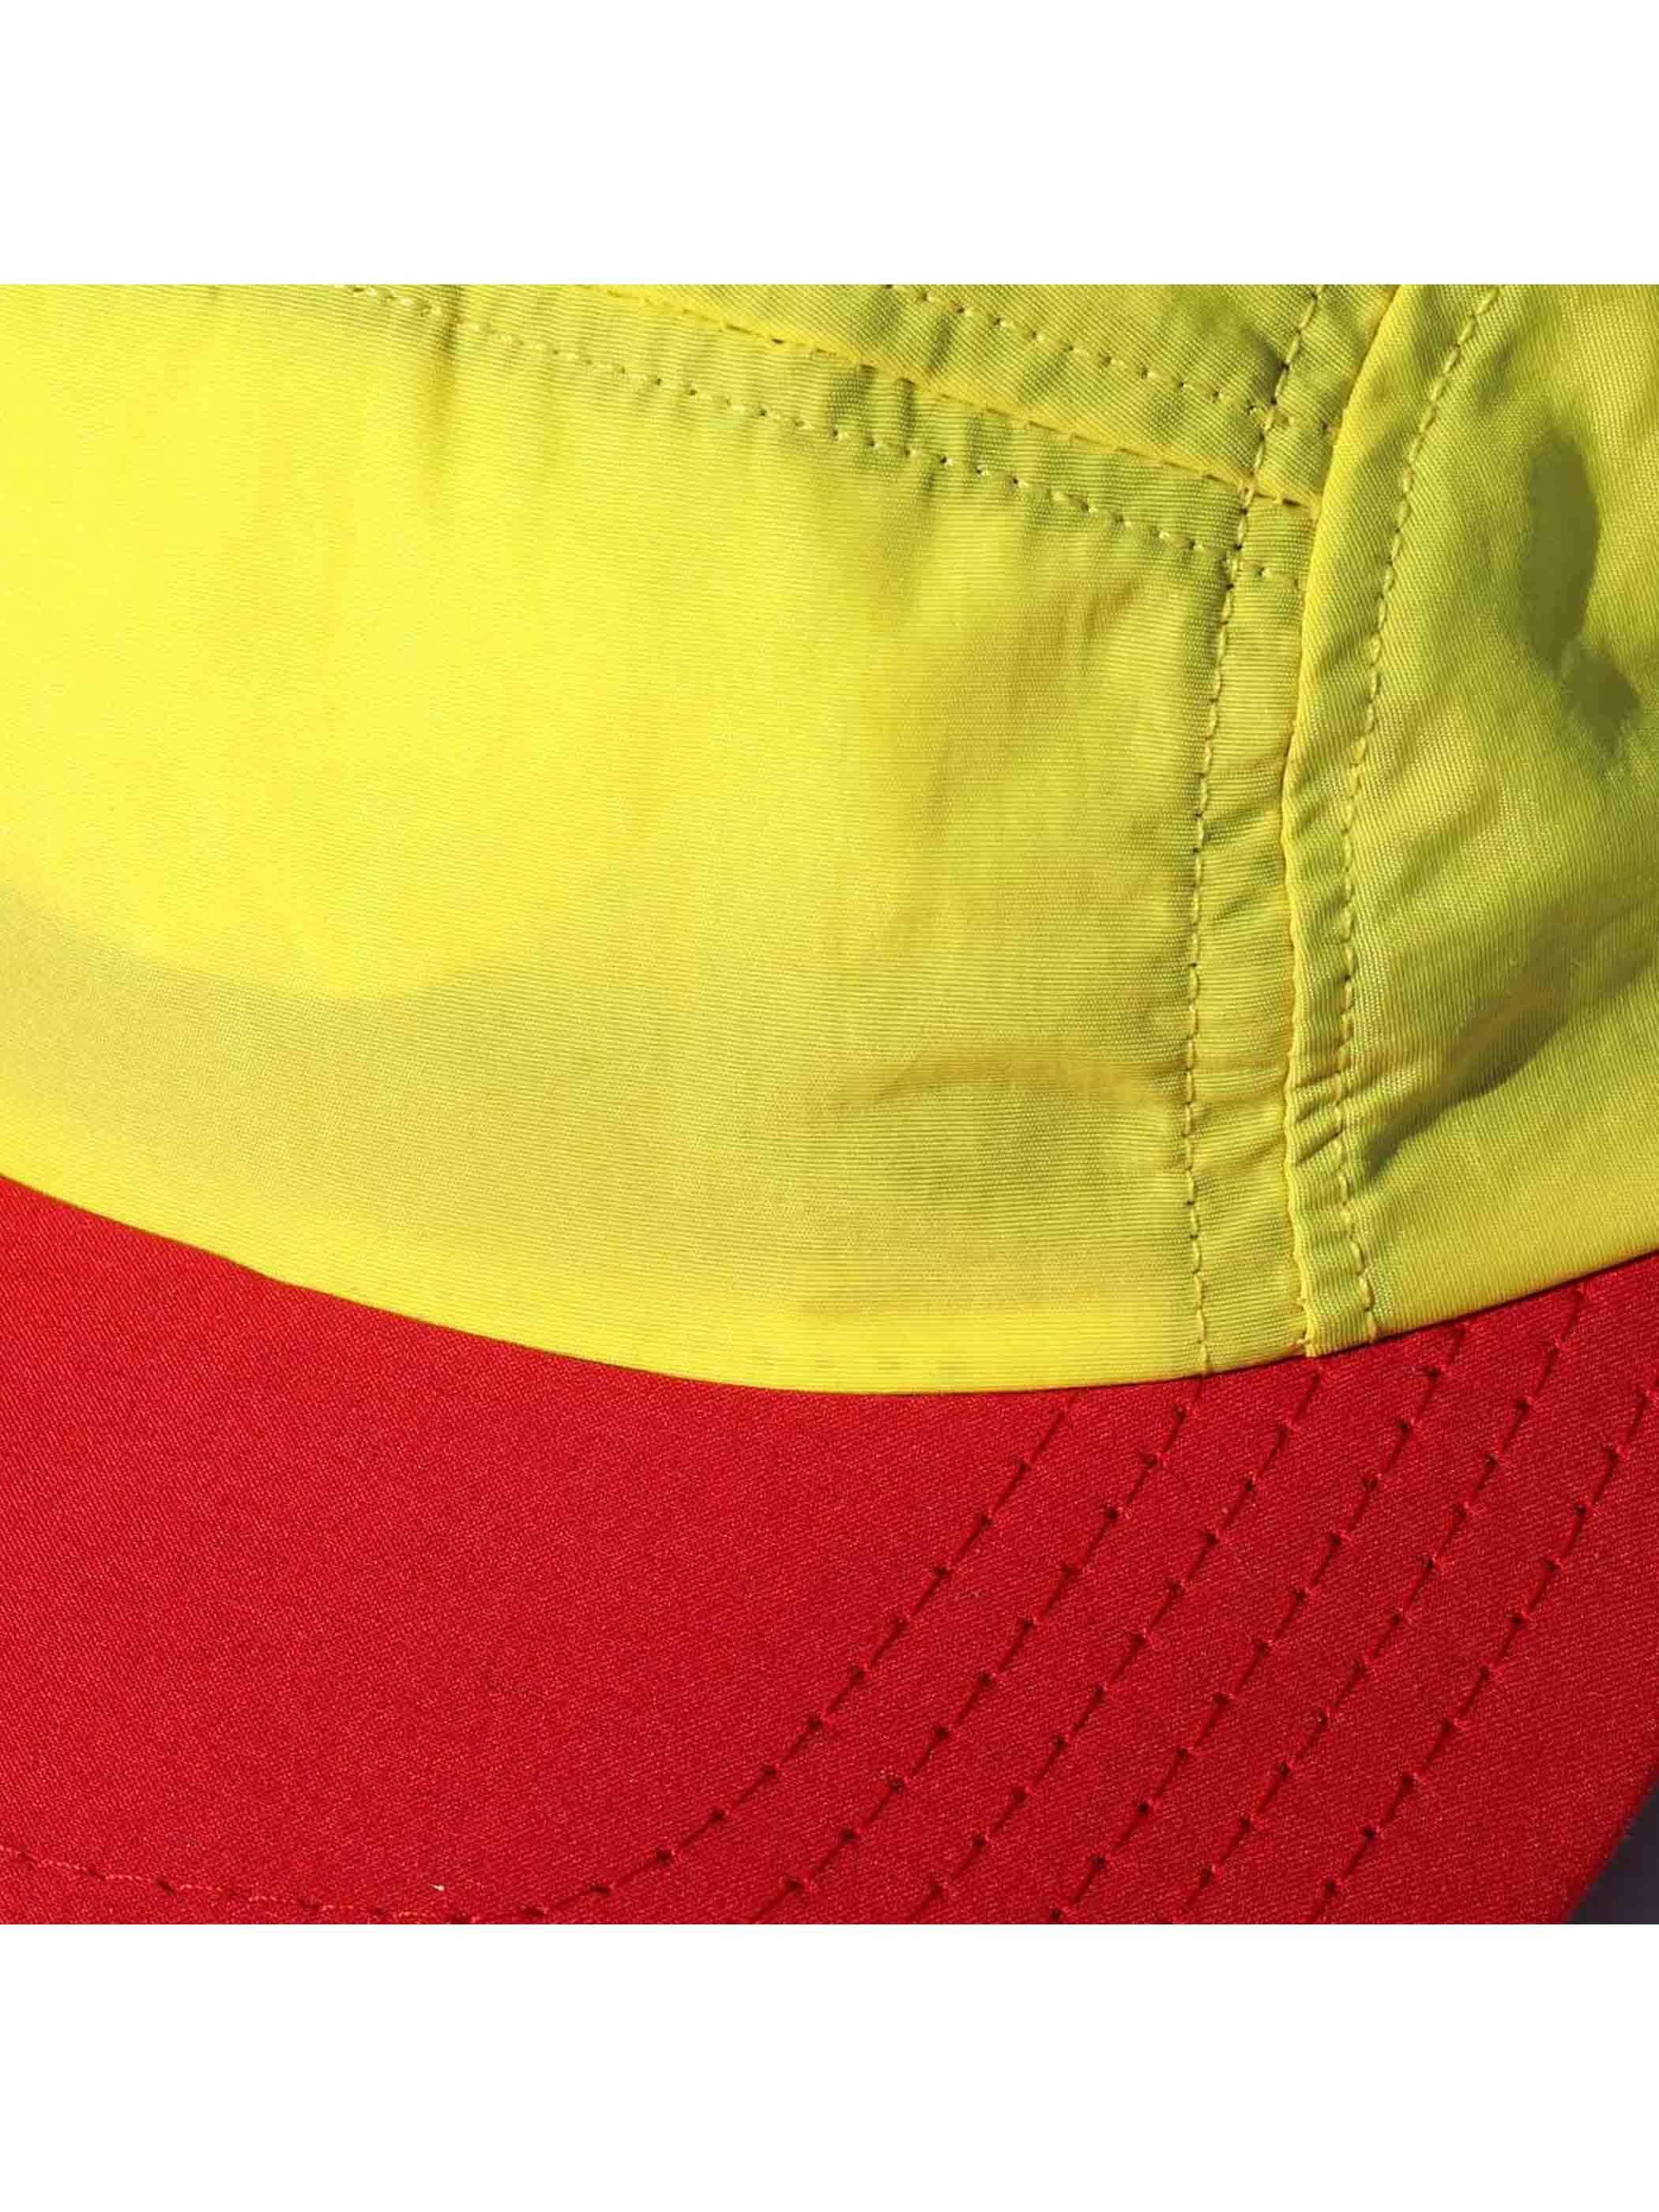 00's NEW ENGLAND CAP USA製 ロングバイザー ナイロンキャップ [FREE]